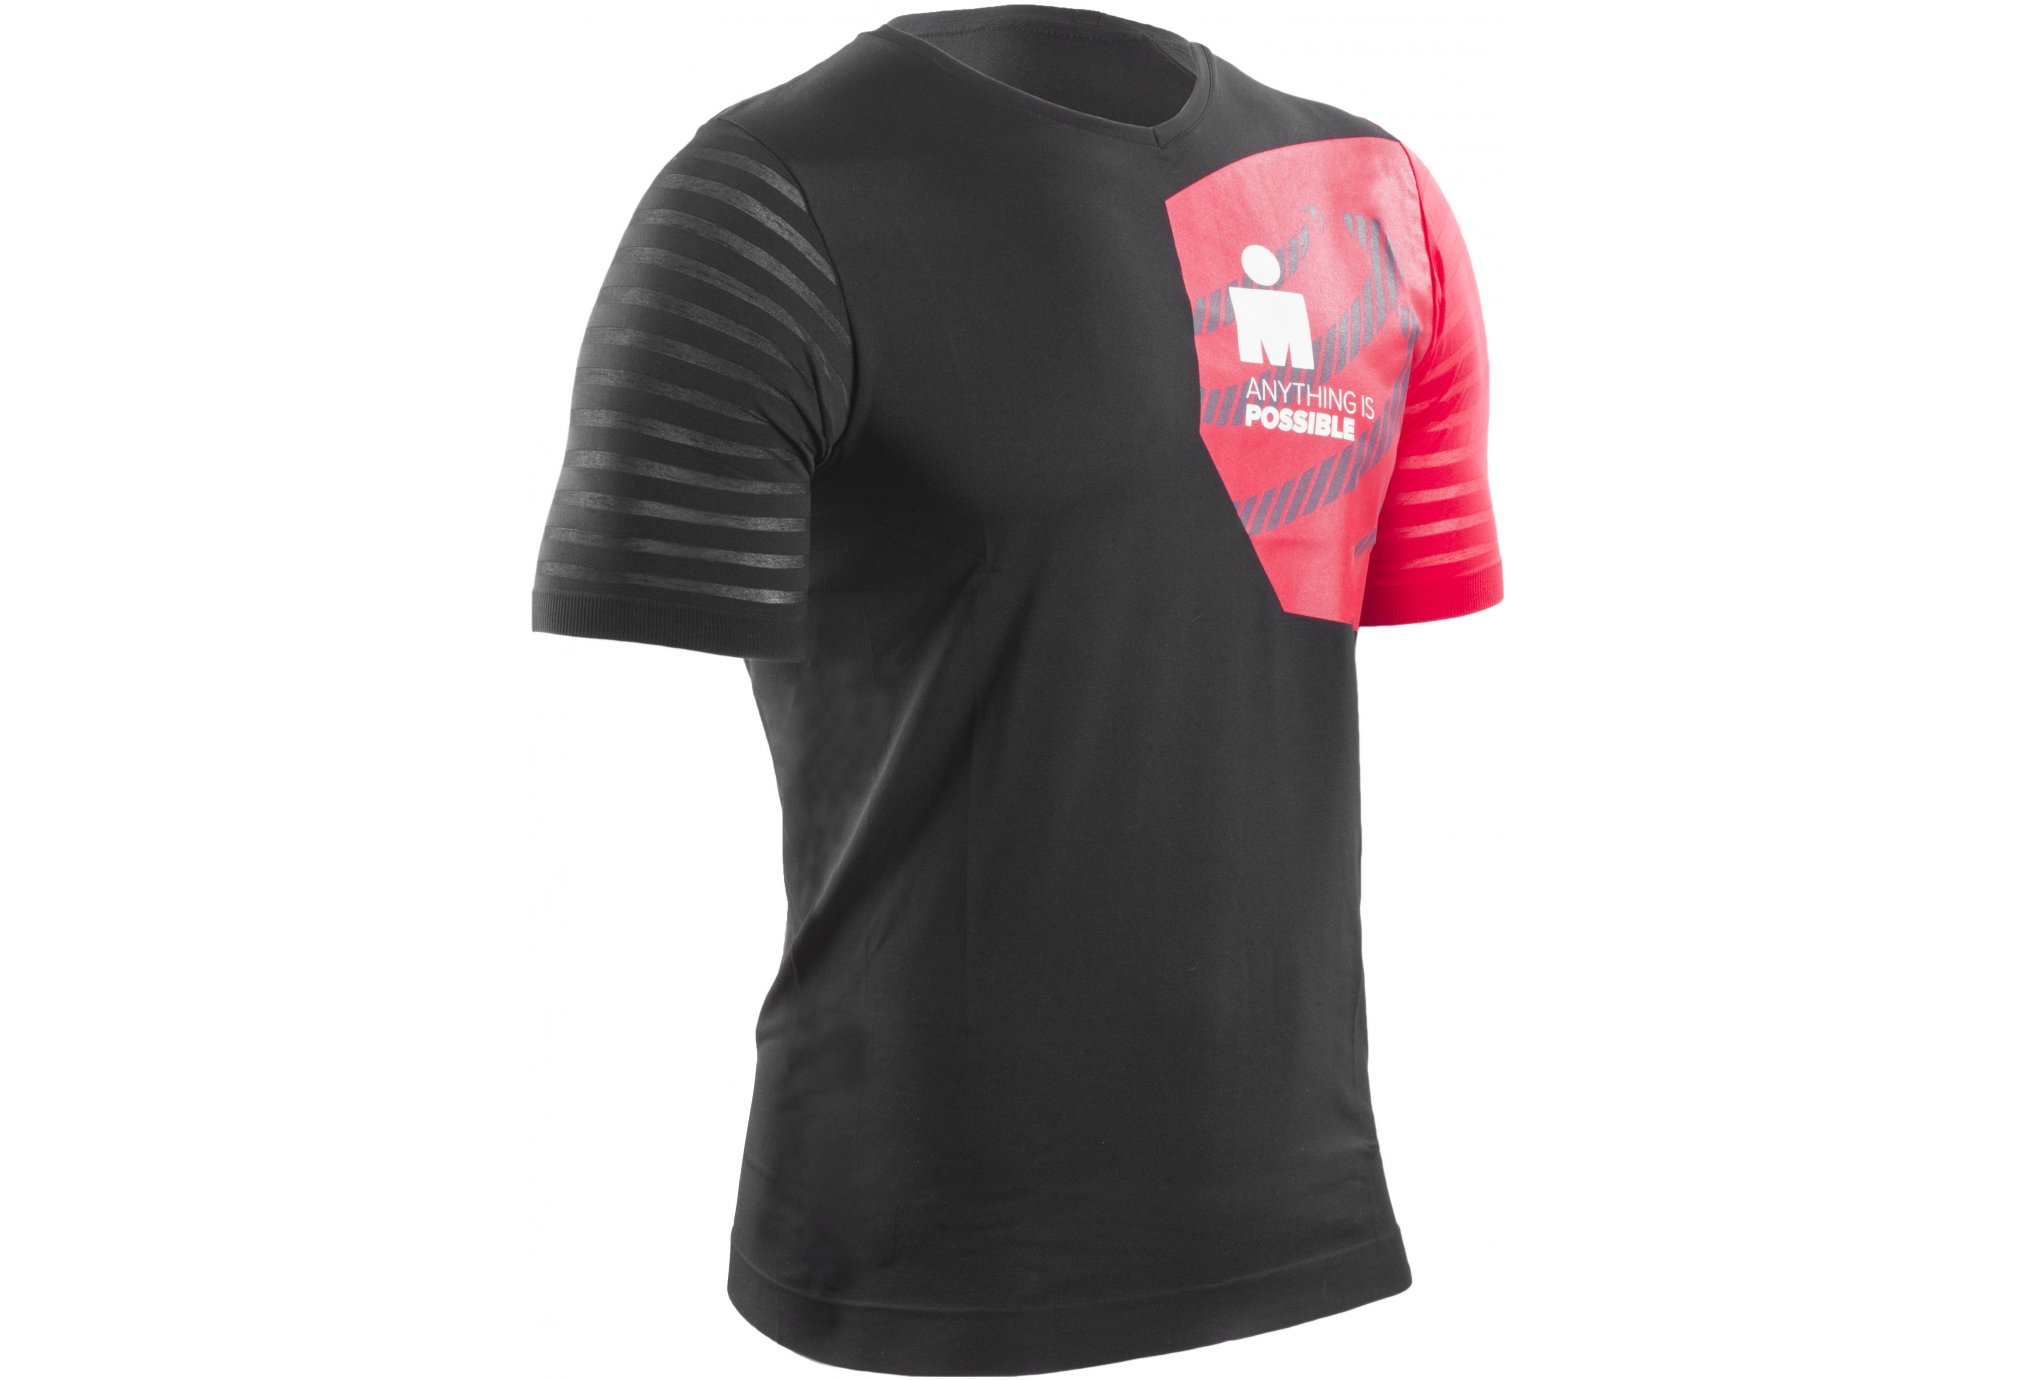 Cyclo randonneurs saint chamonais - Compressport Training Tshirt M ... 014d1d74109